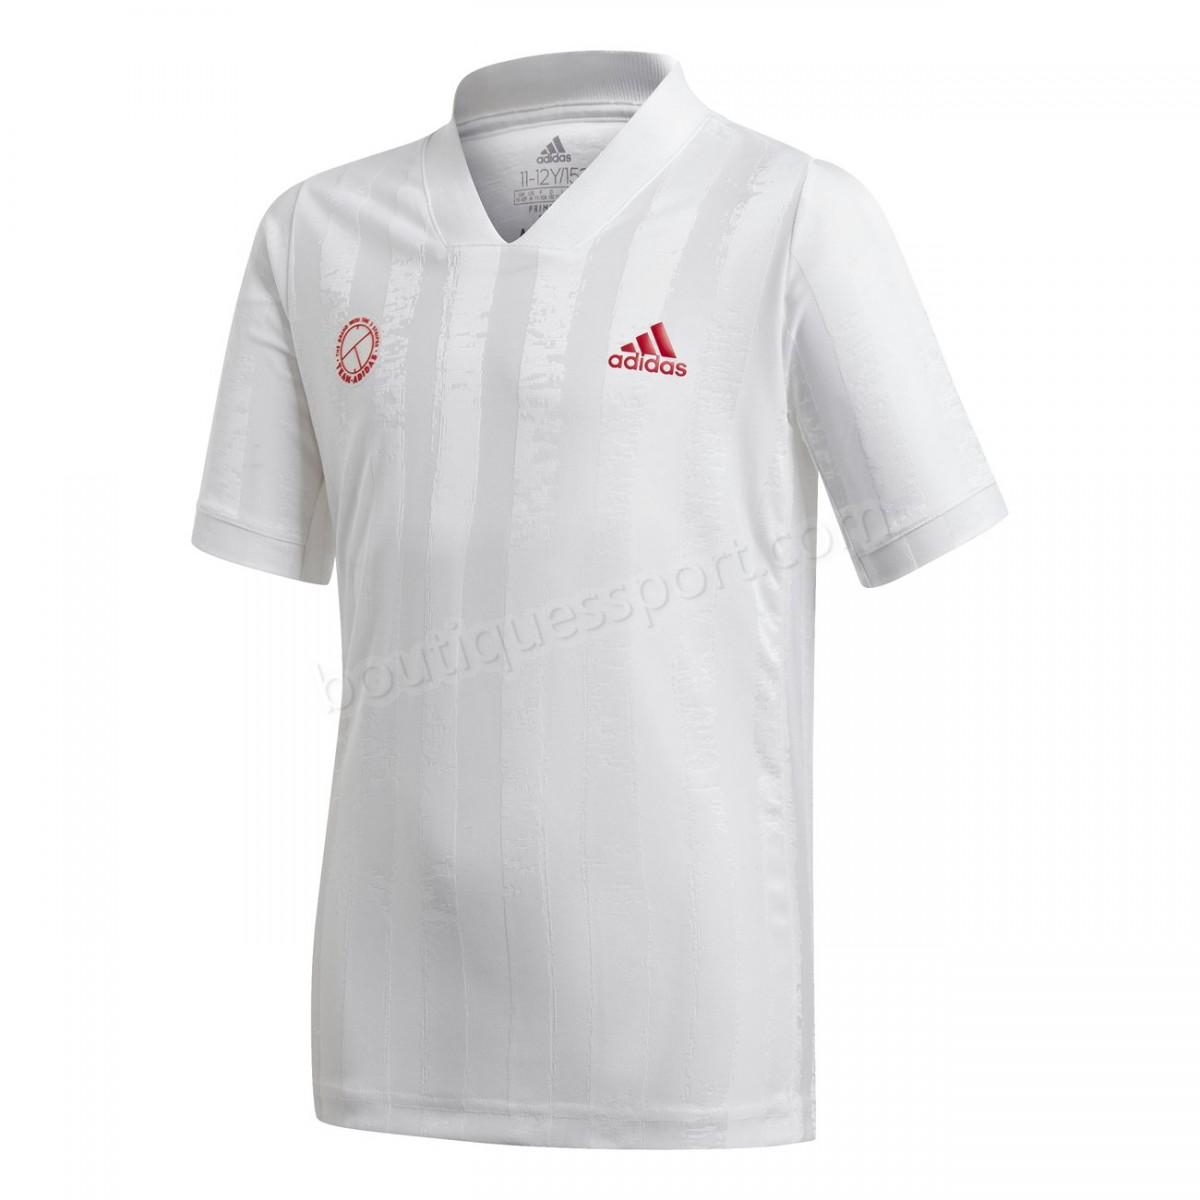 Tennis enfant ADIDAS T-shirt junior adidas Printed Freelift Soldes - Tennis enfant ADIDAS T-shirt junior adidas Printed Freelift Soldes